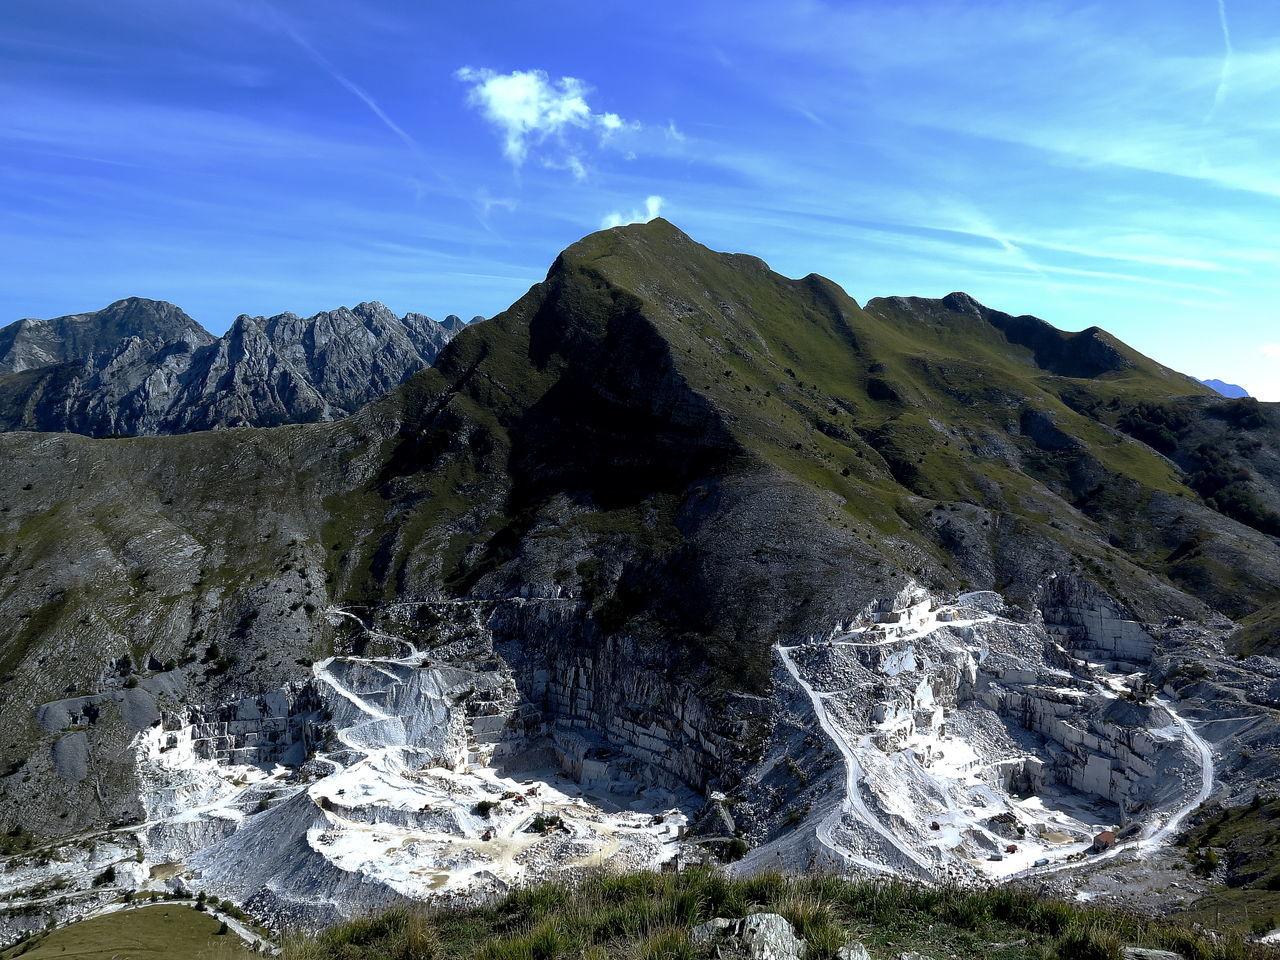 Alpi Alpi Apuane Apuane Apuane Mountains Cave Marble Mine Mine Tuscany